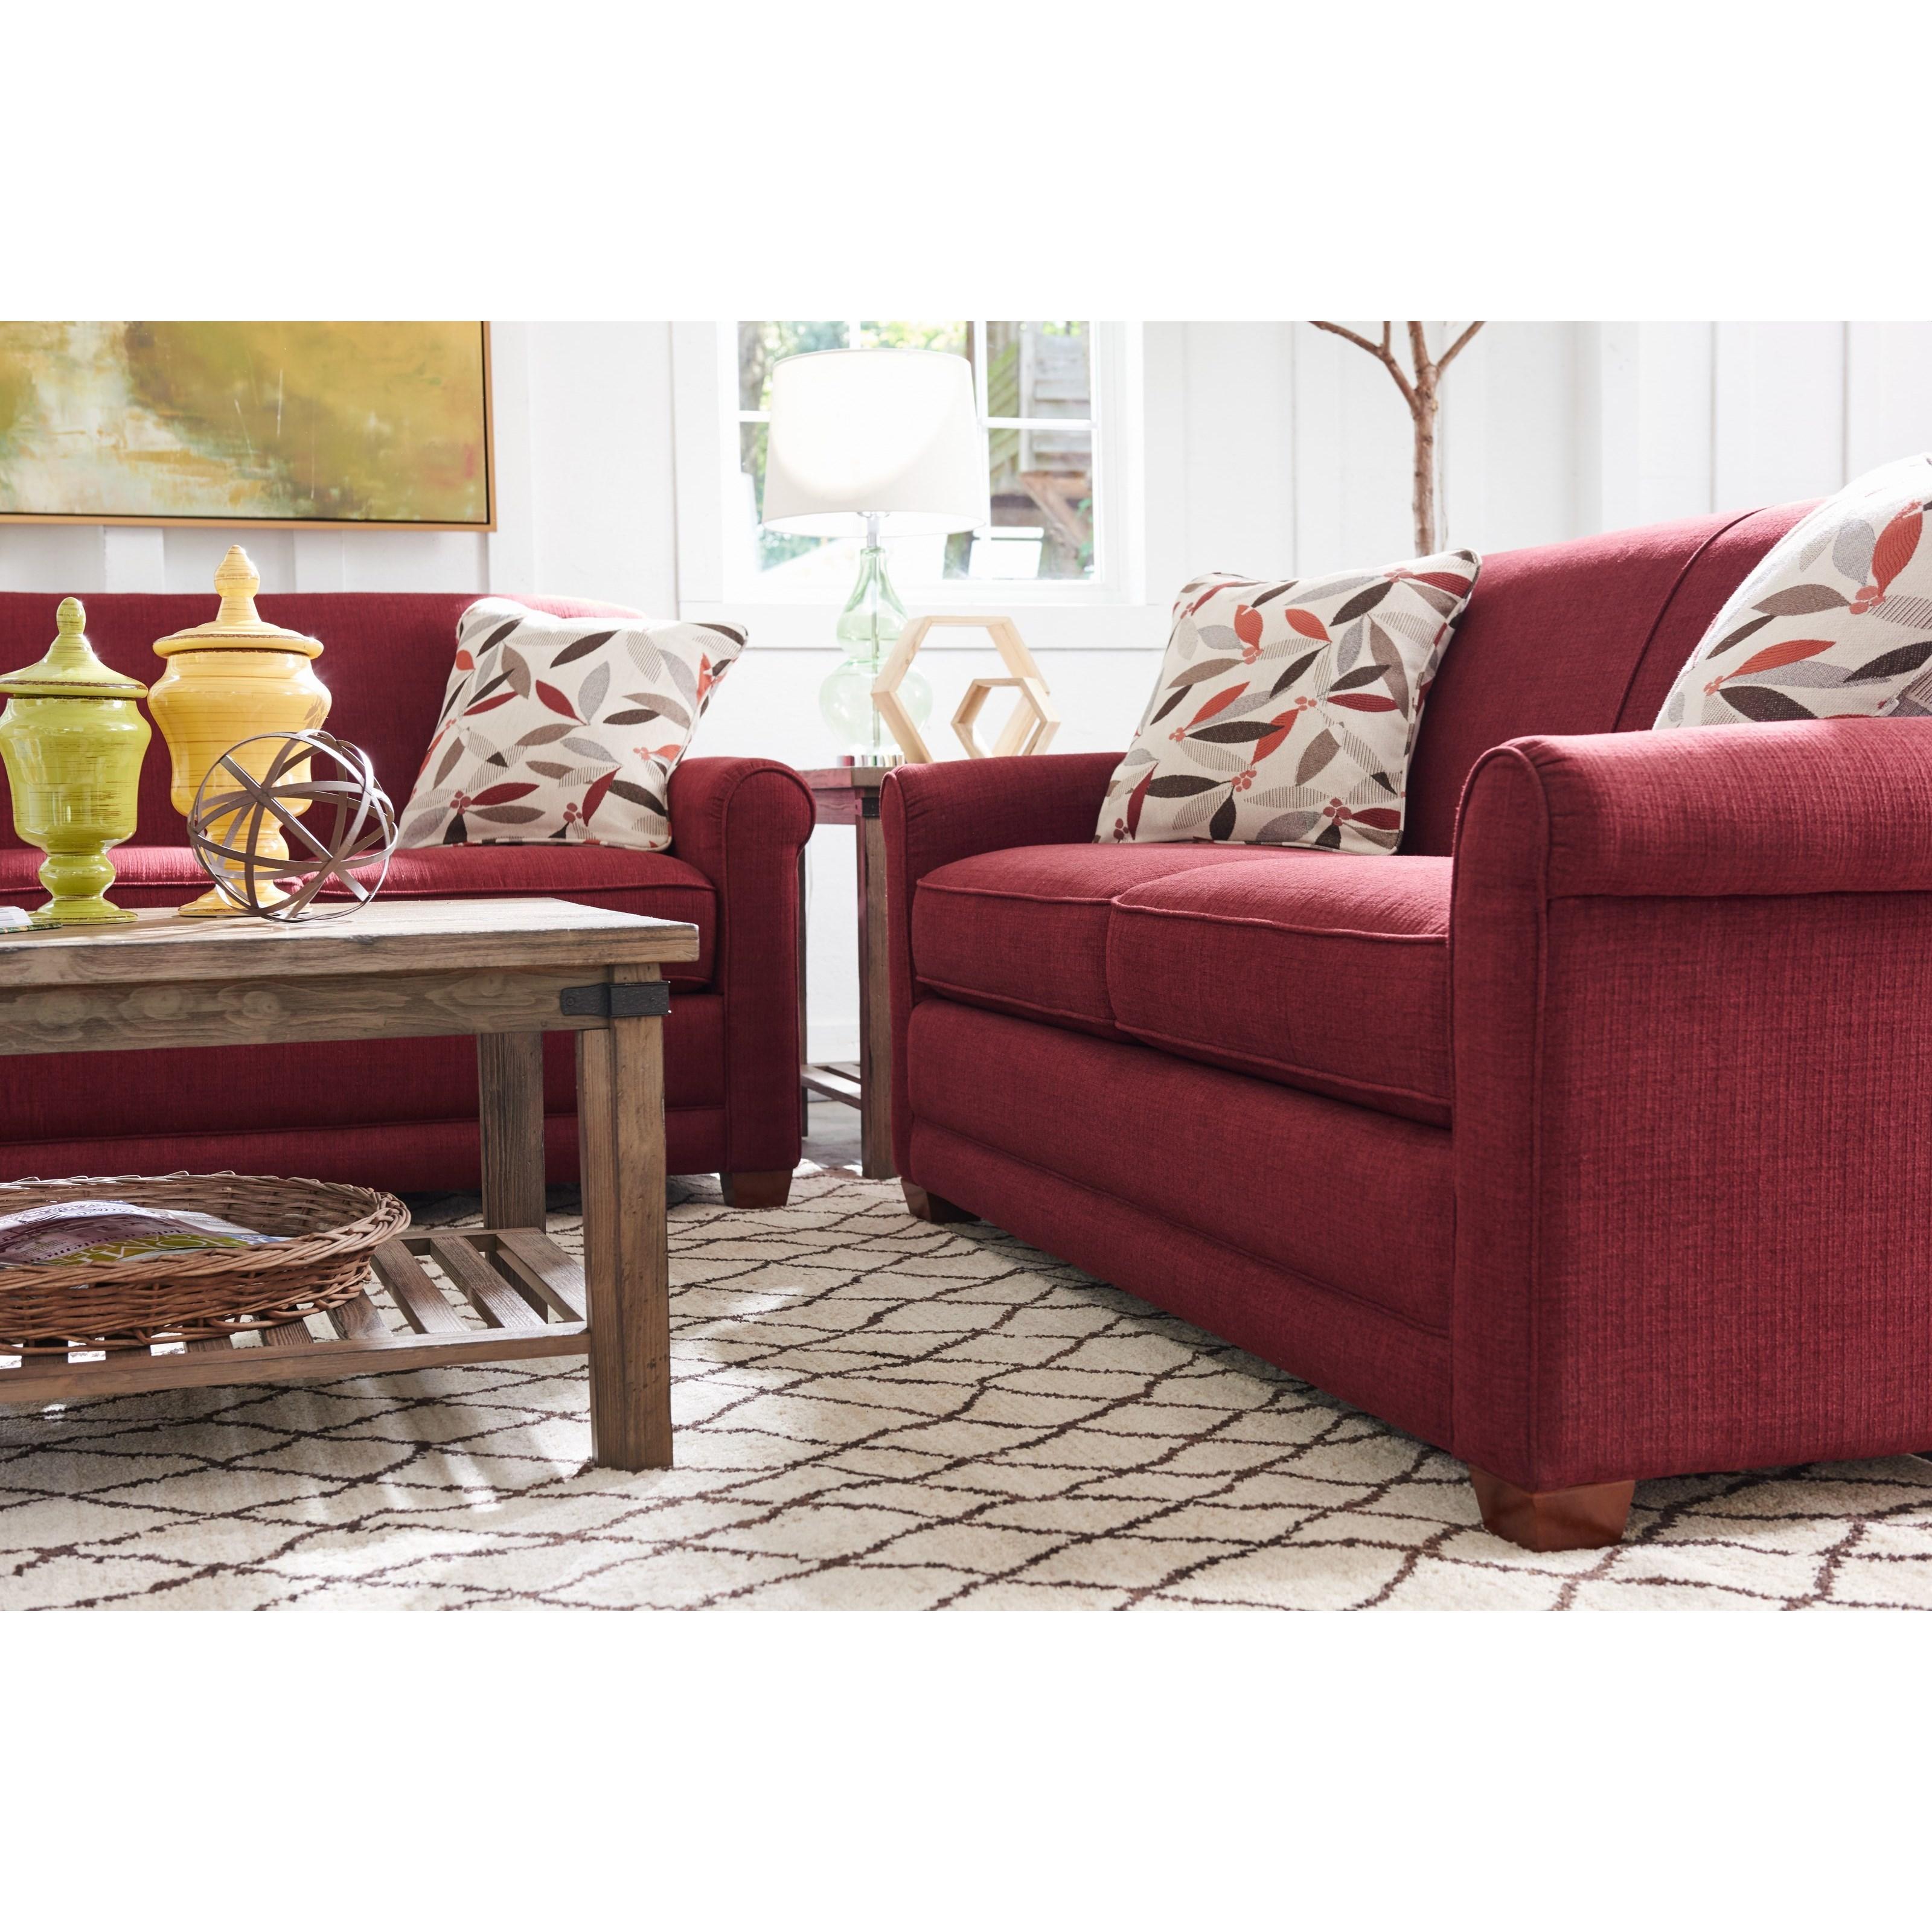 la z boy amanda casual apartment size sofa with premier comfortcore cushions knight furniture. Black Bedroom Furniture Sets. Home Design Ideas